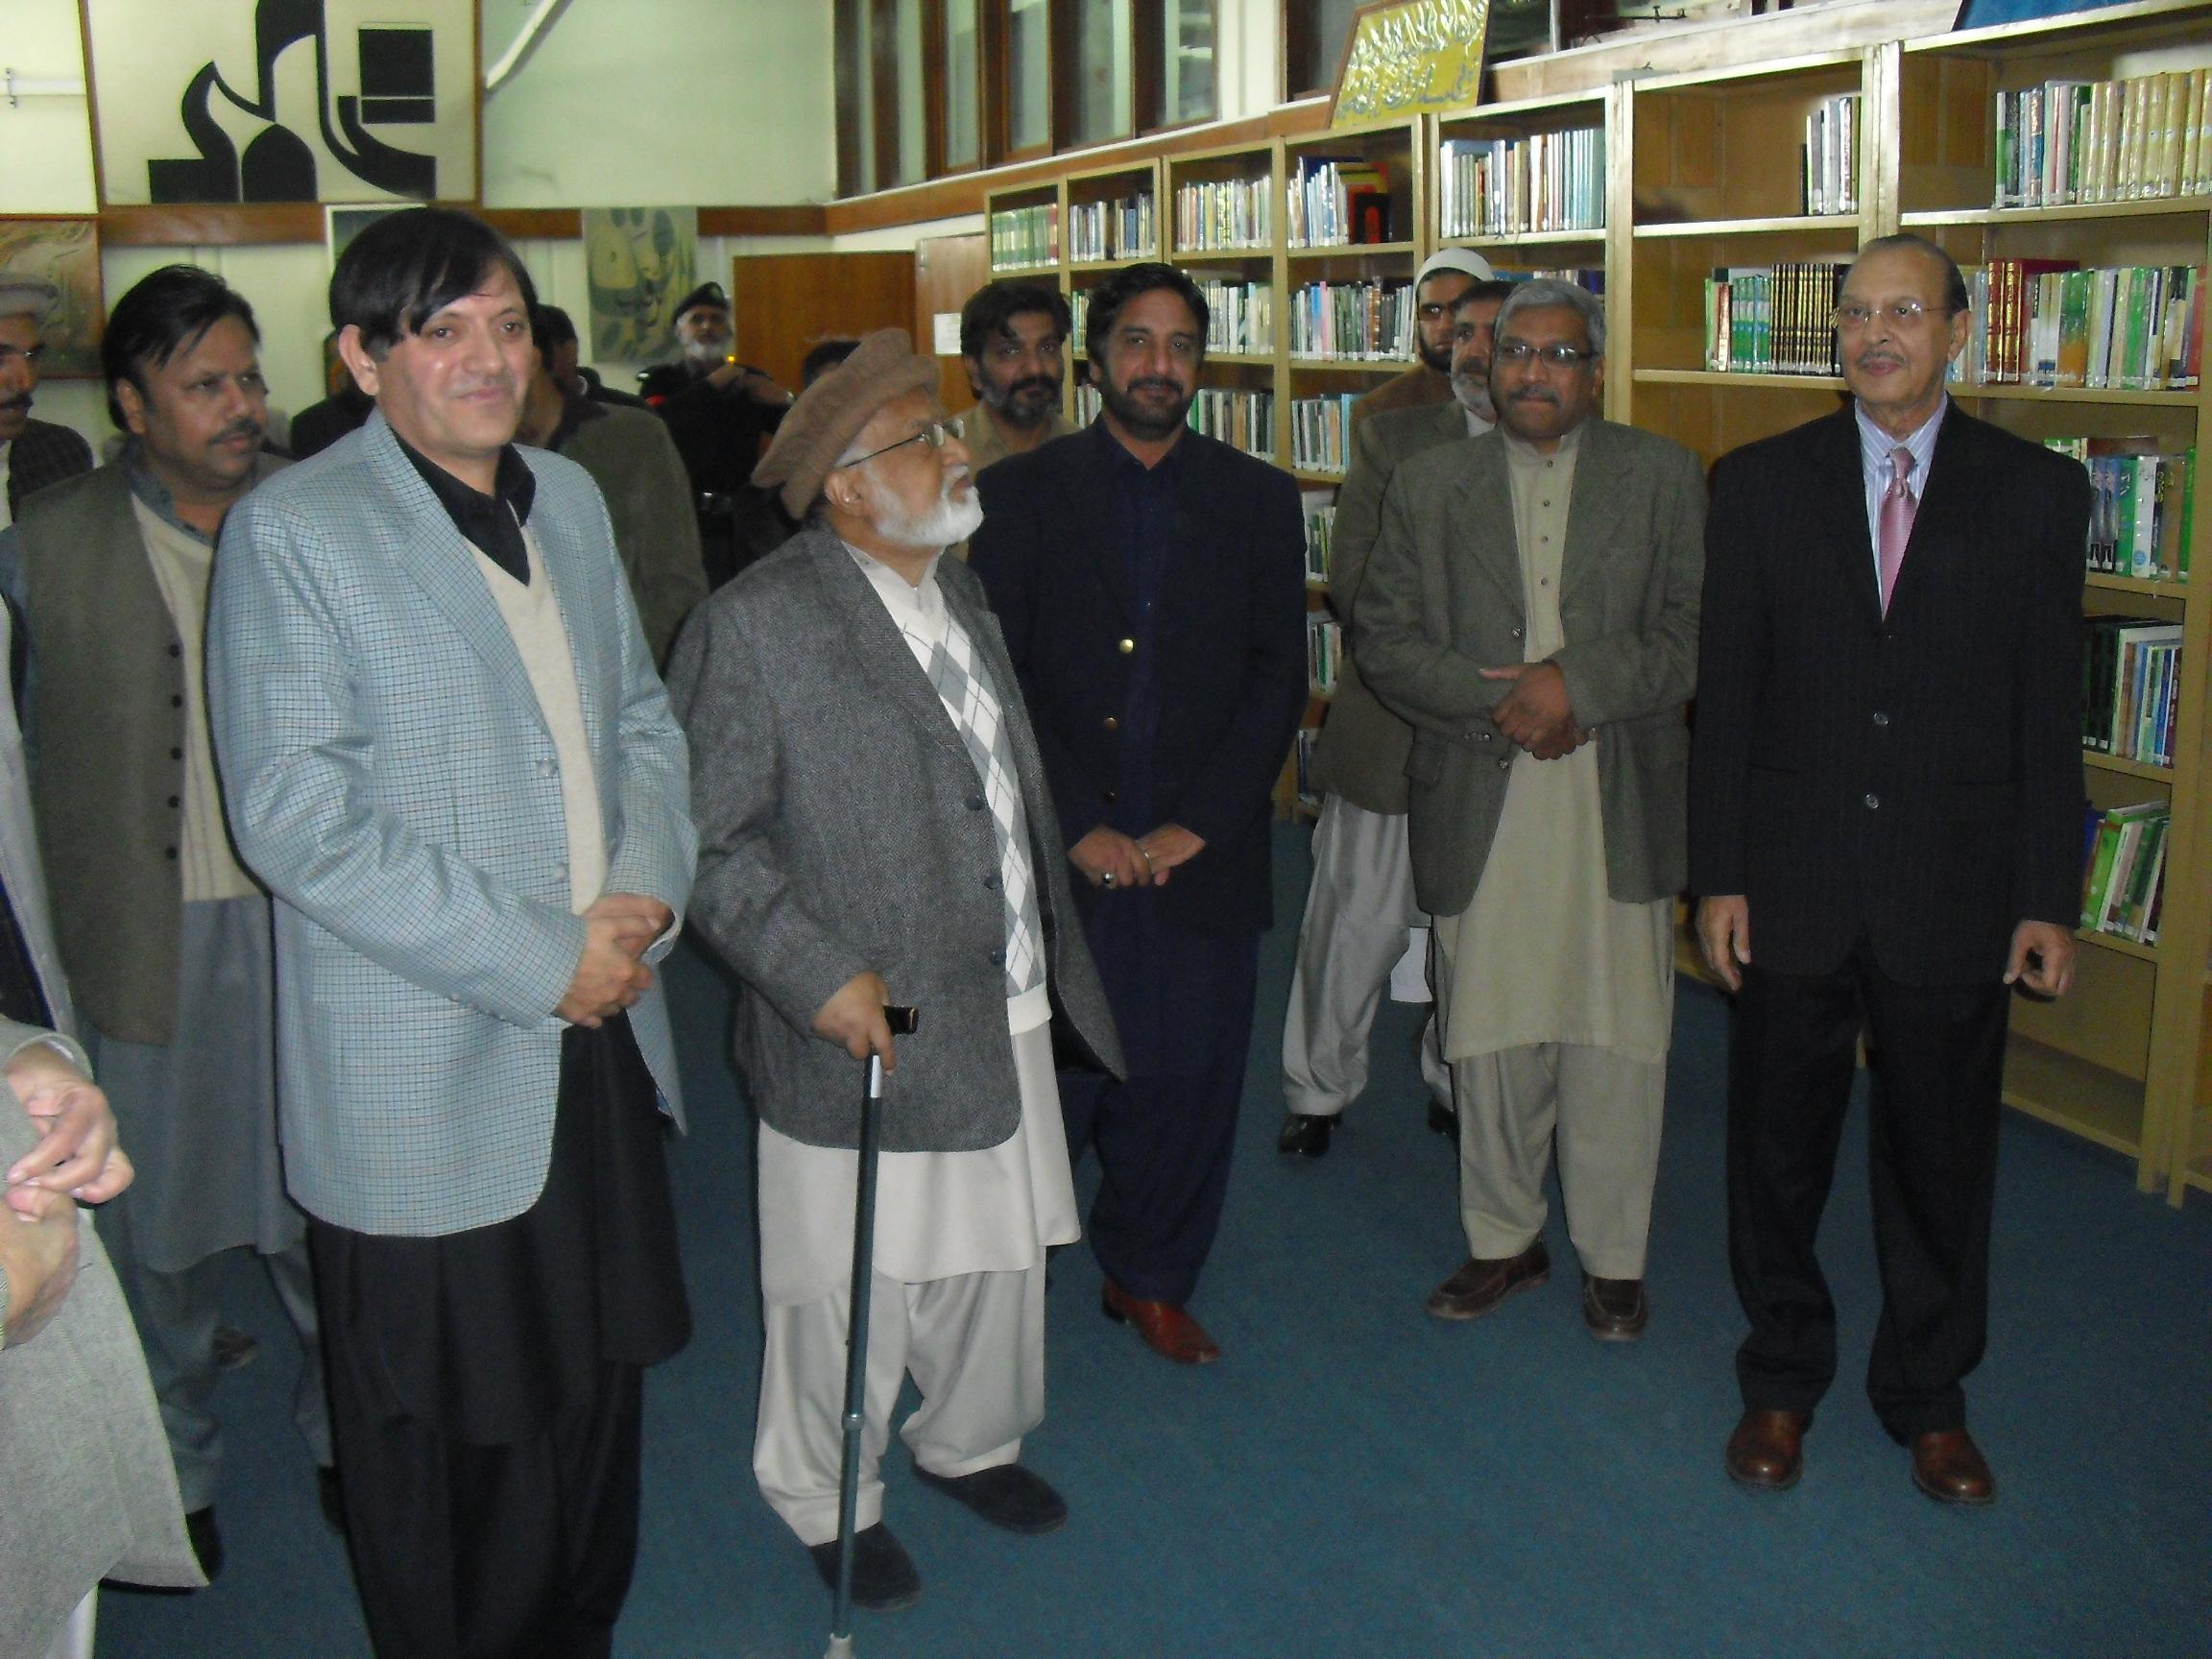 Dr. Zafar Ishaq Ansari and Dr. Mumtaz Ahmed visit